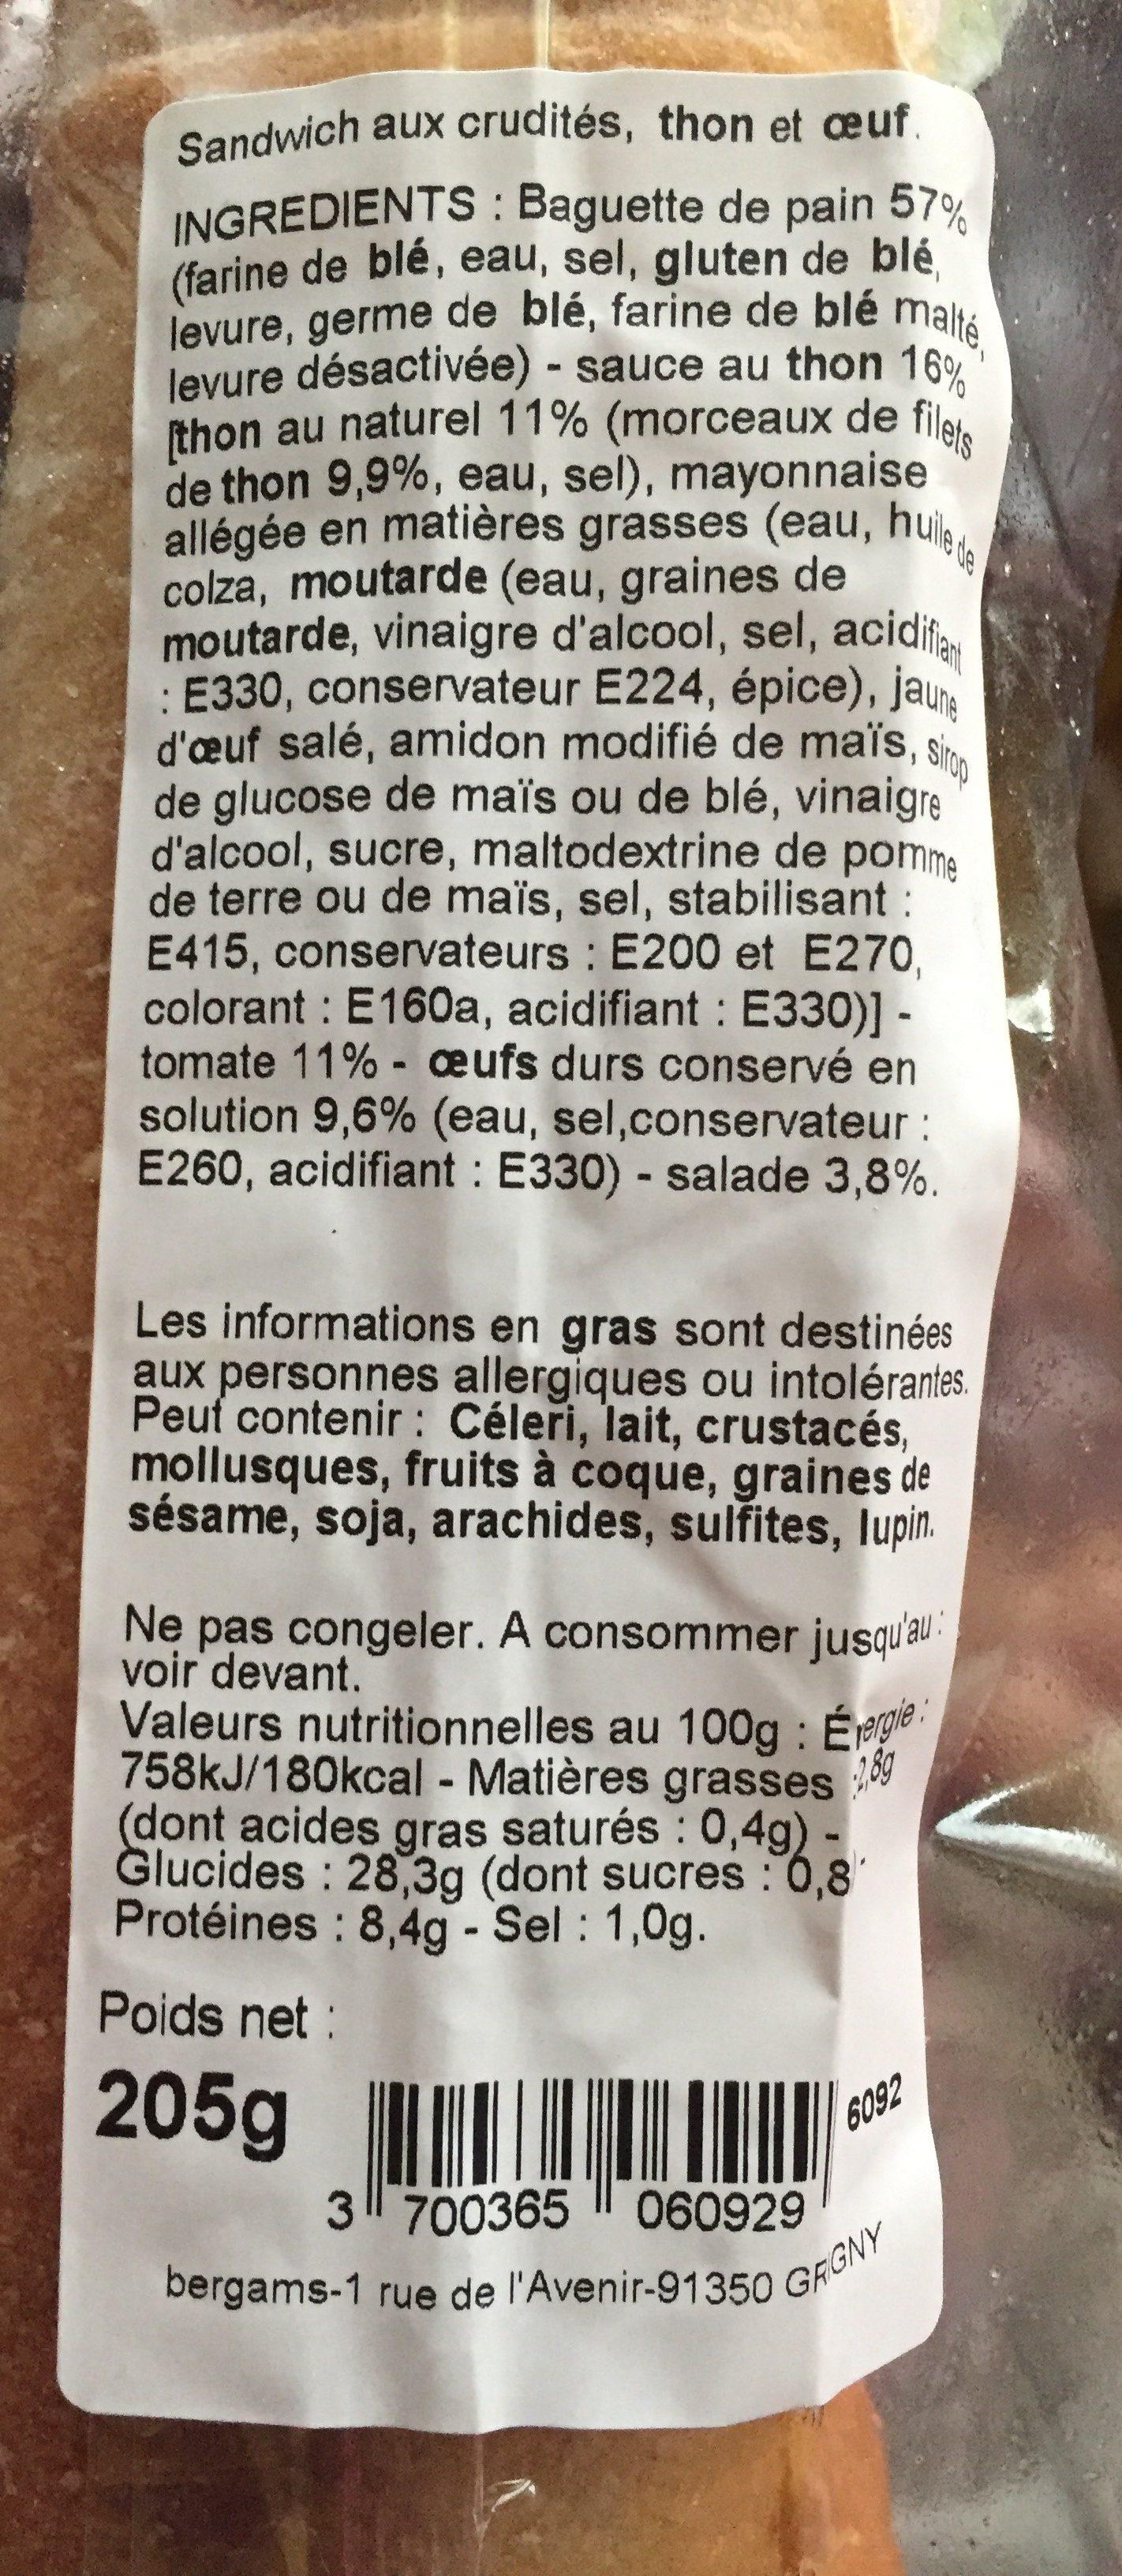 Baguette Thon Oeuf Crudites - Ingredients